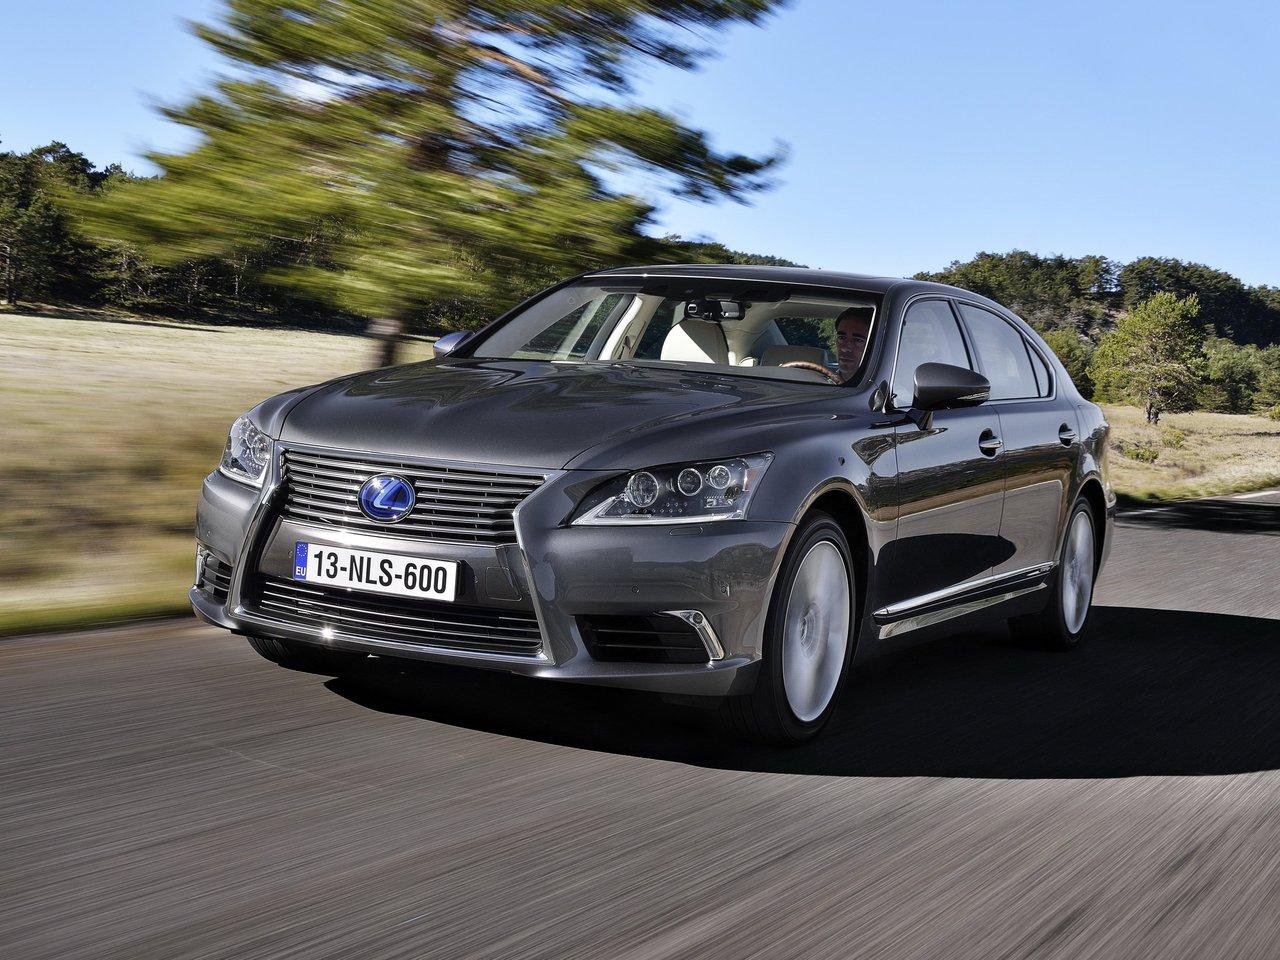 Снимки: Lexus LS 4 Facelift